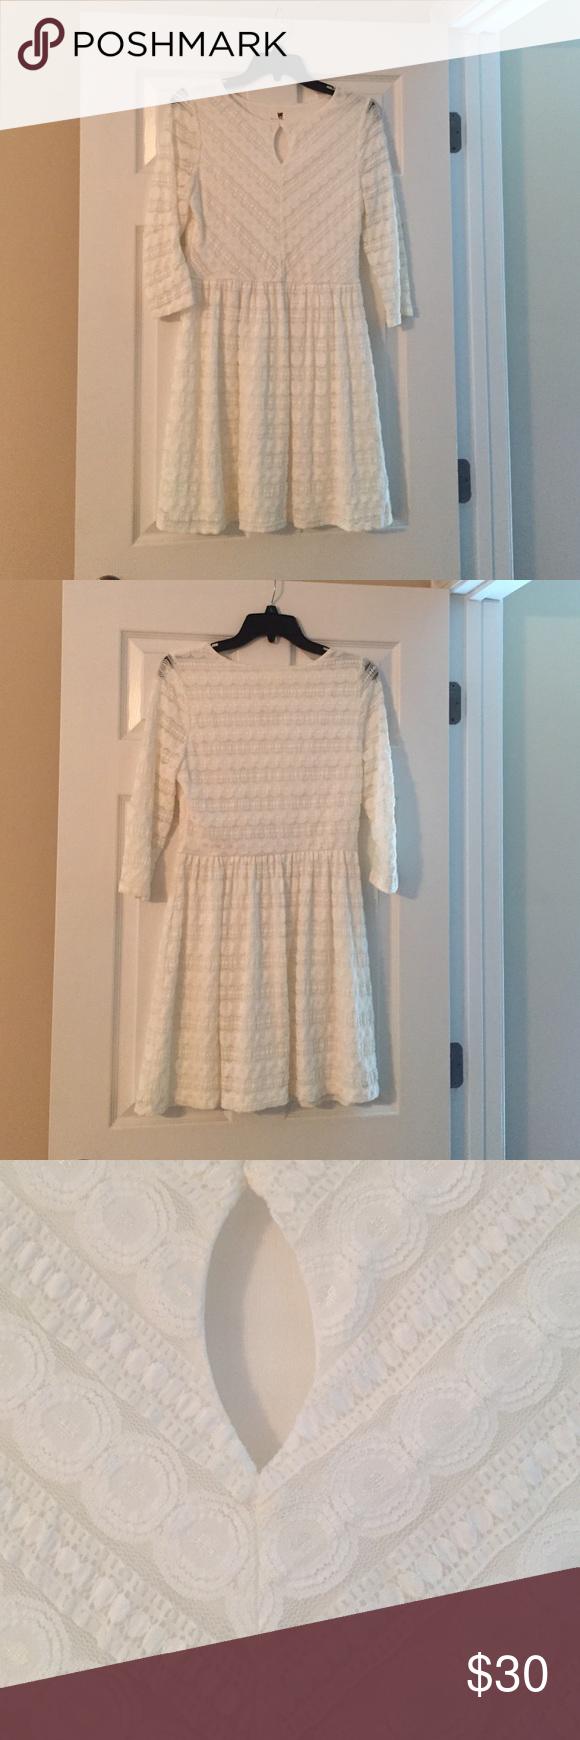 White 3/4 sleeve dress with key hole cut out White 3/4 sleeve dress with key hole cut out Pink Owl Dresses Long Sleeve